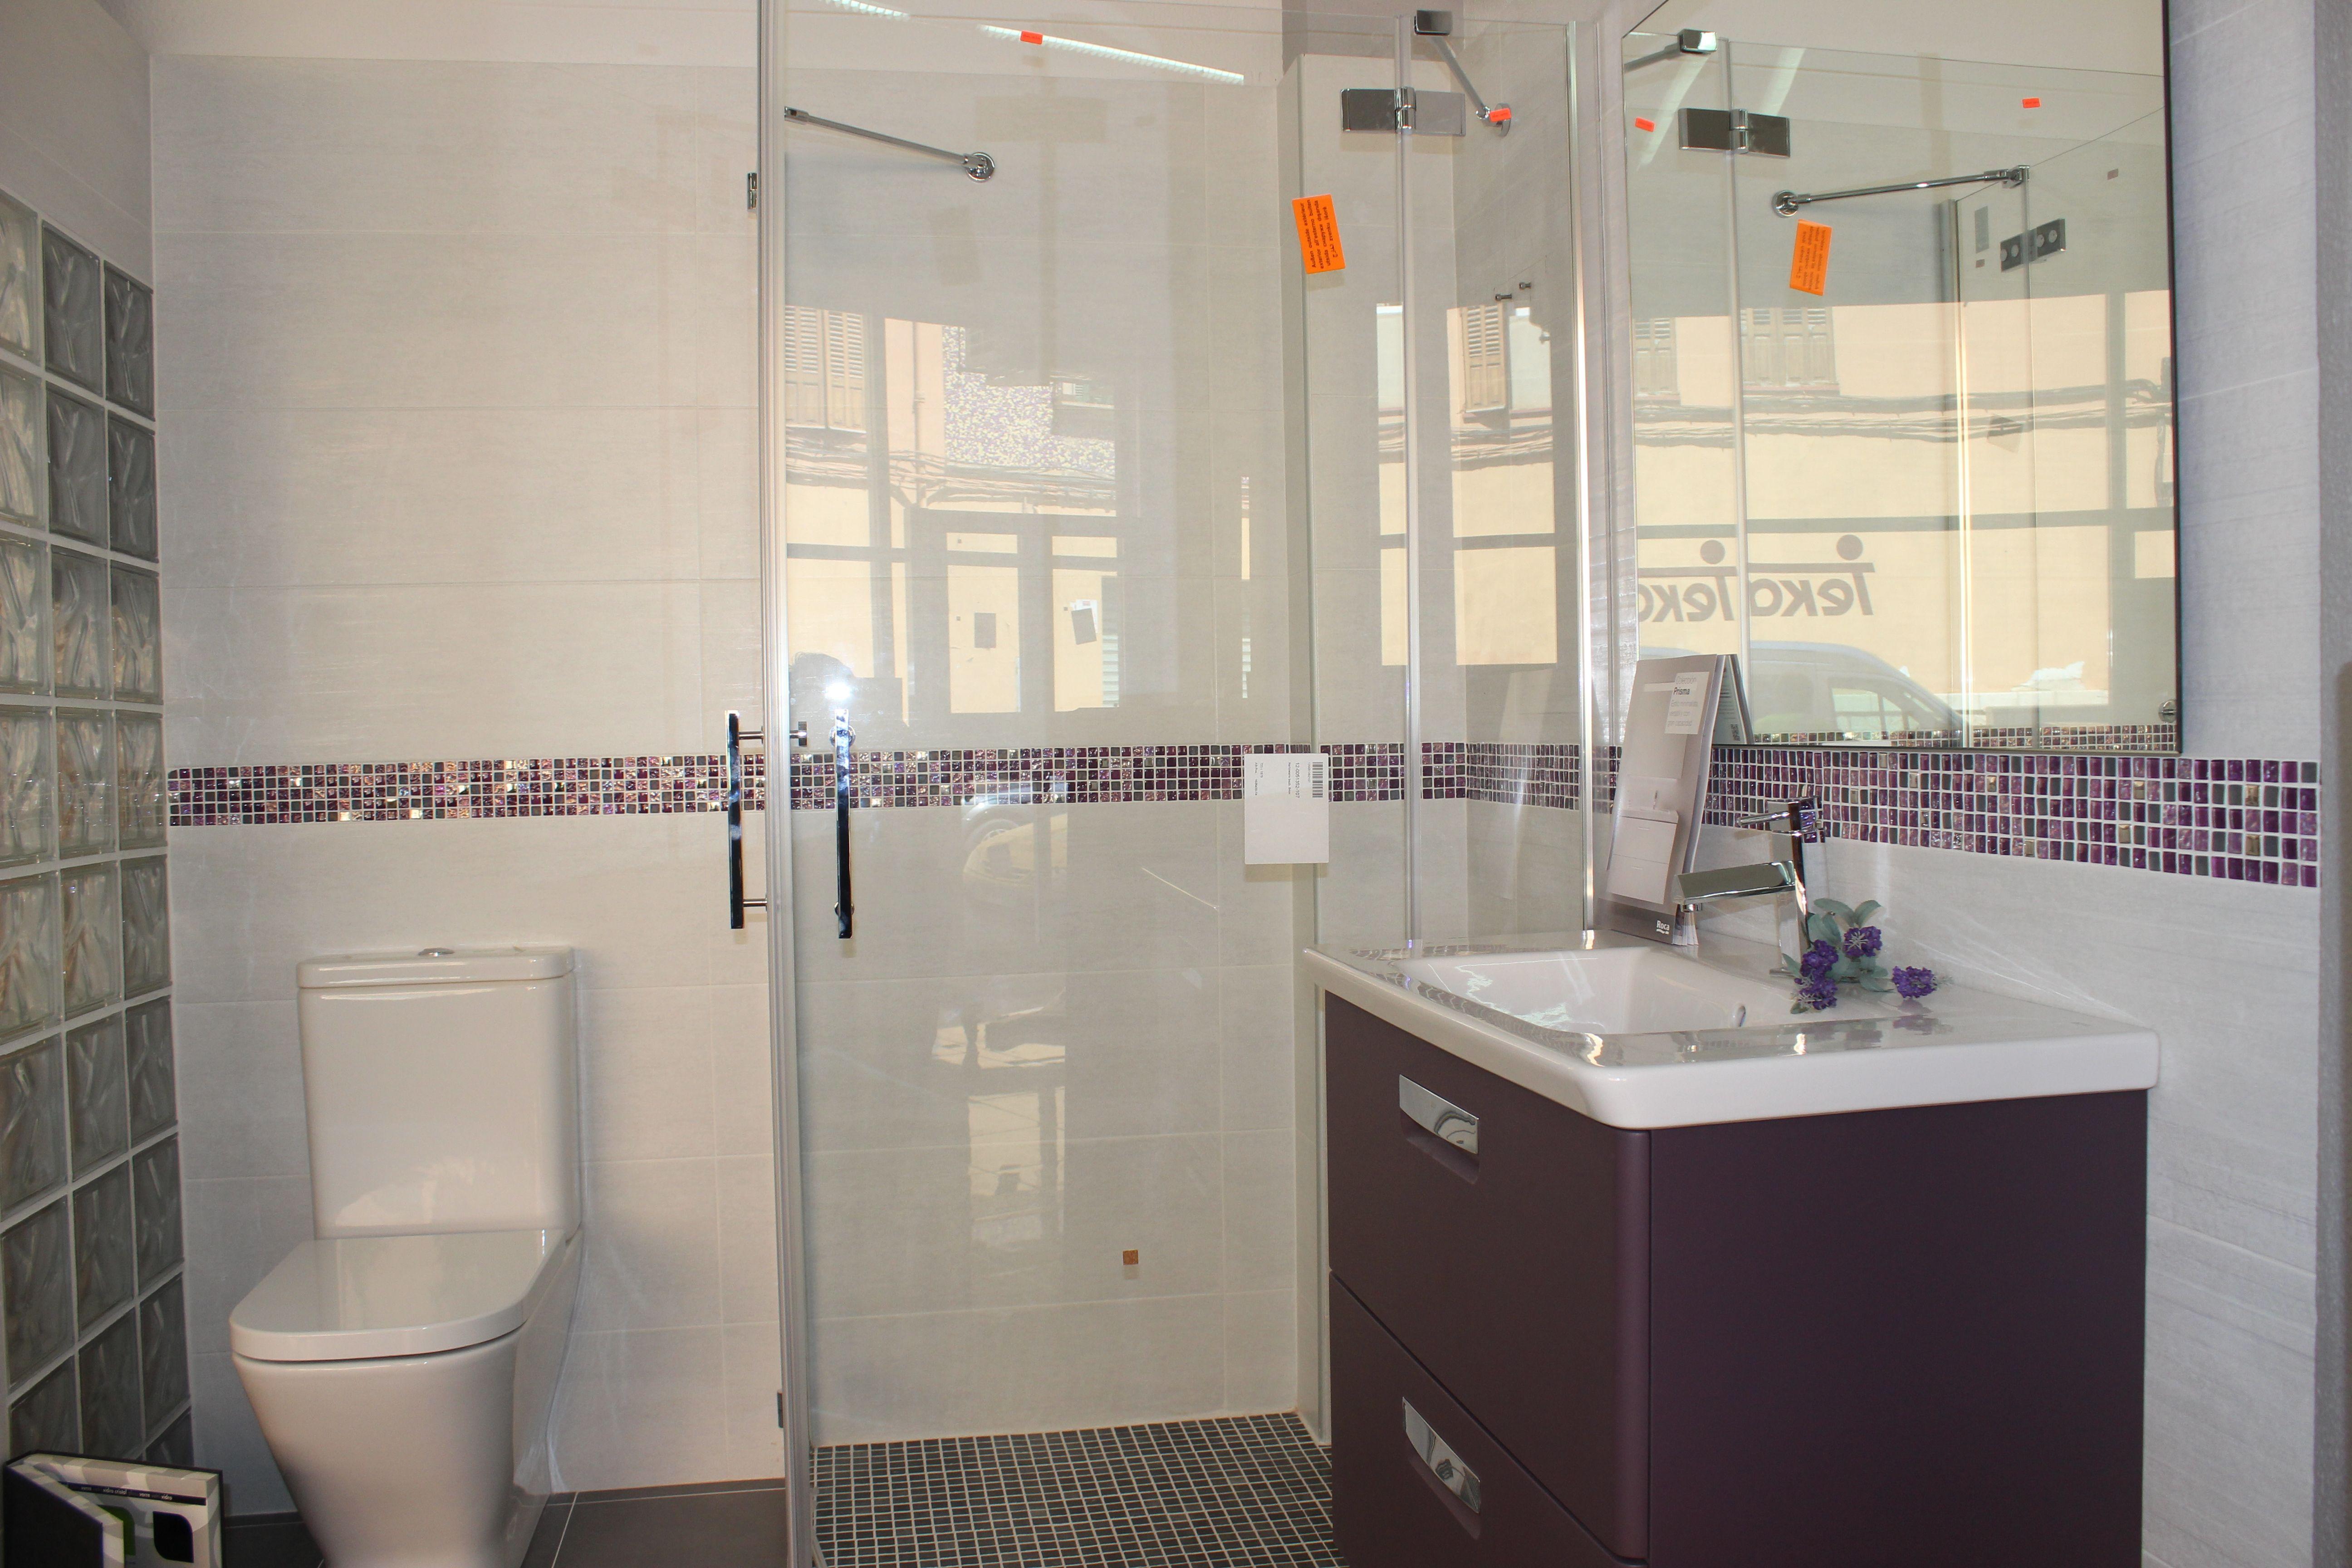 Mamparas de baño y ducha en Palma de Mallorca